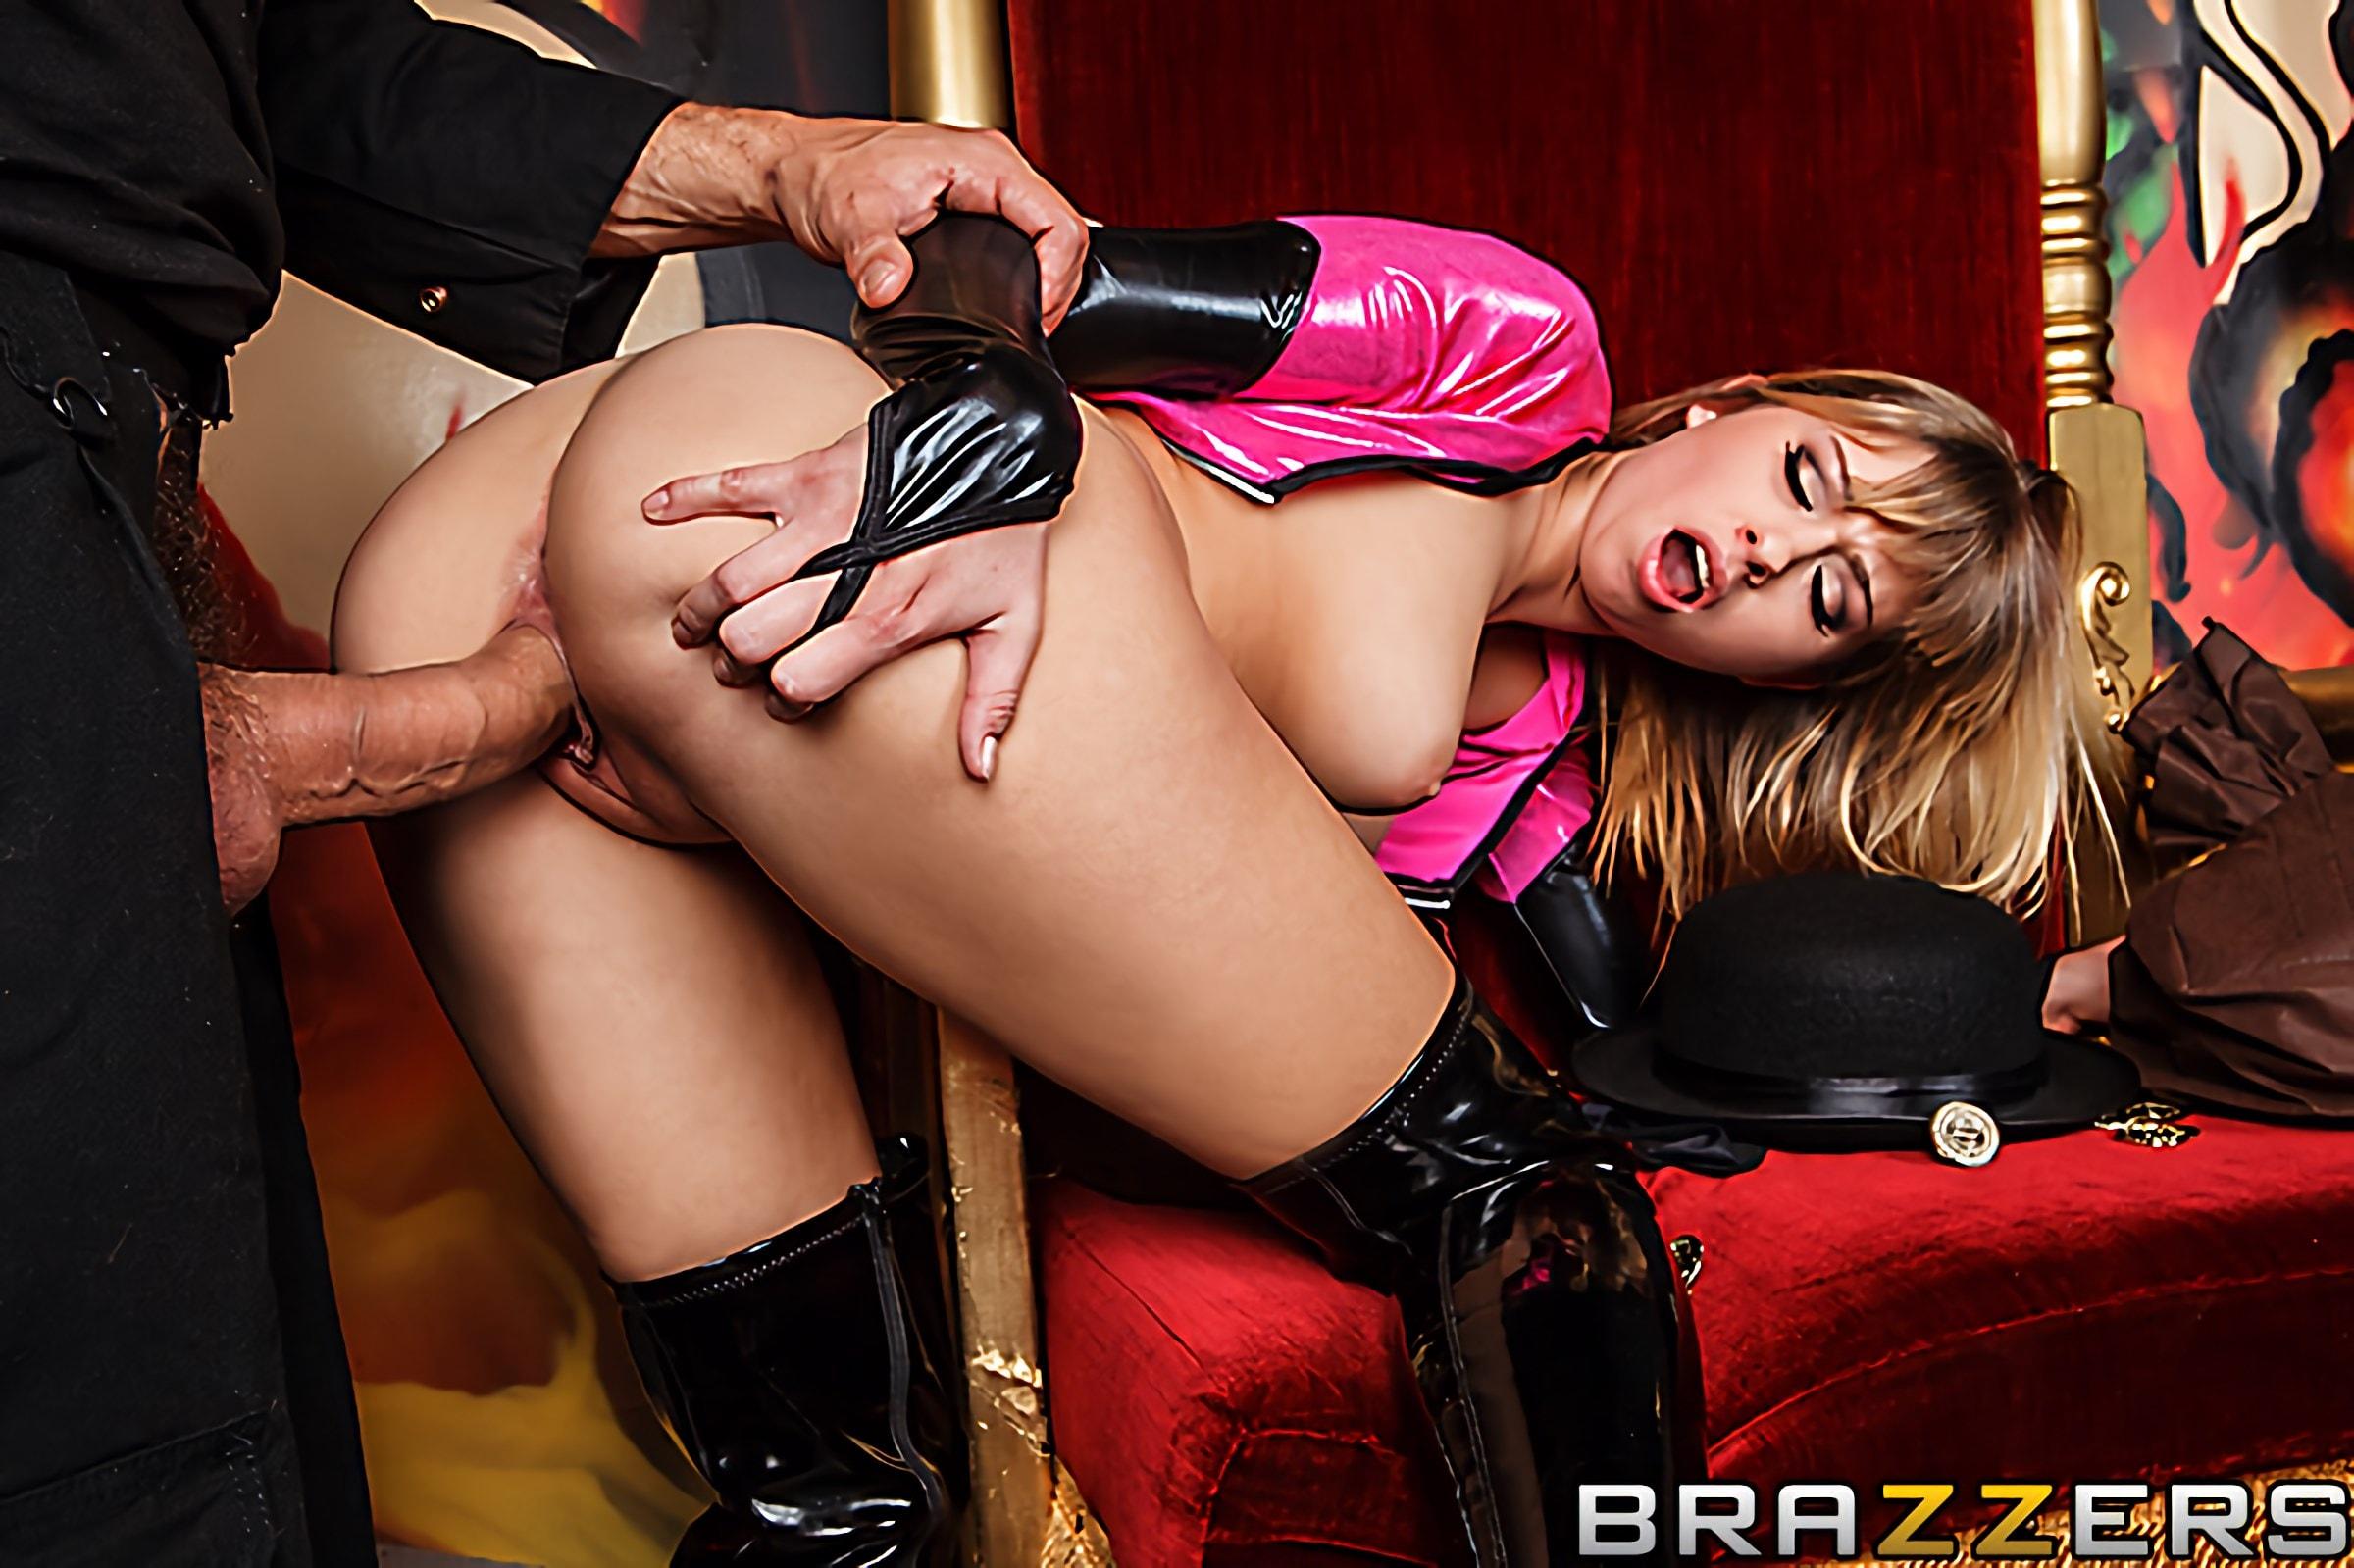 Brazzers 'Wonder Pussy' starring Molly Bennett (Photo 9)